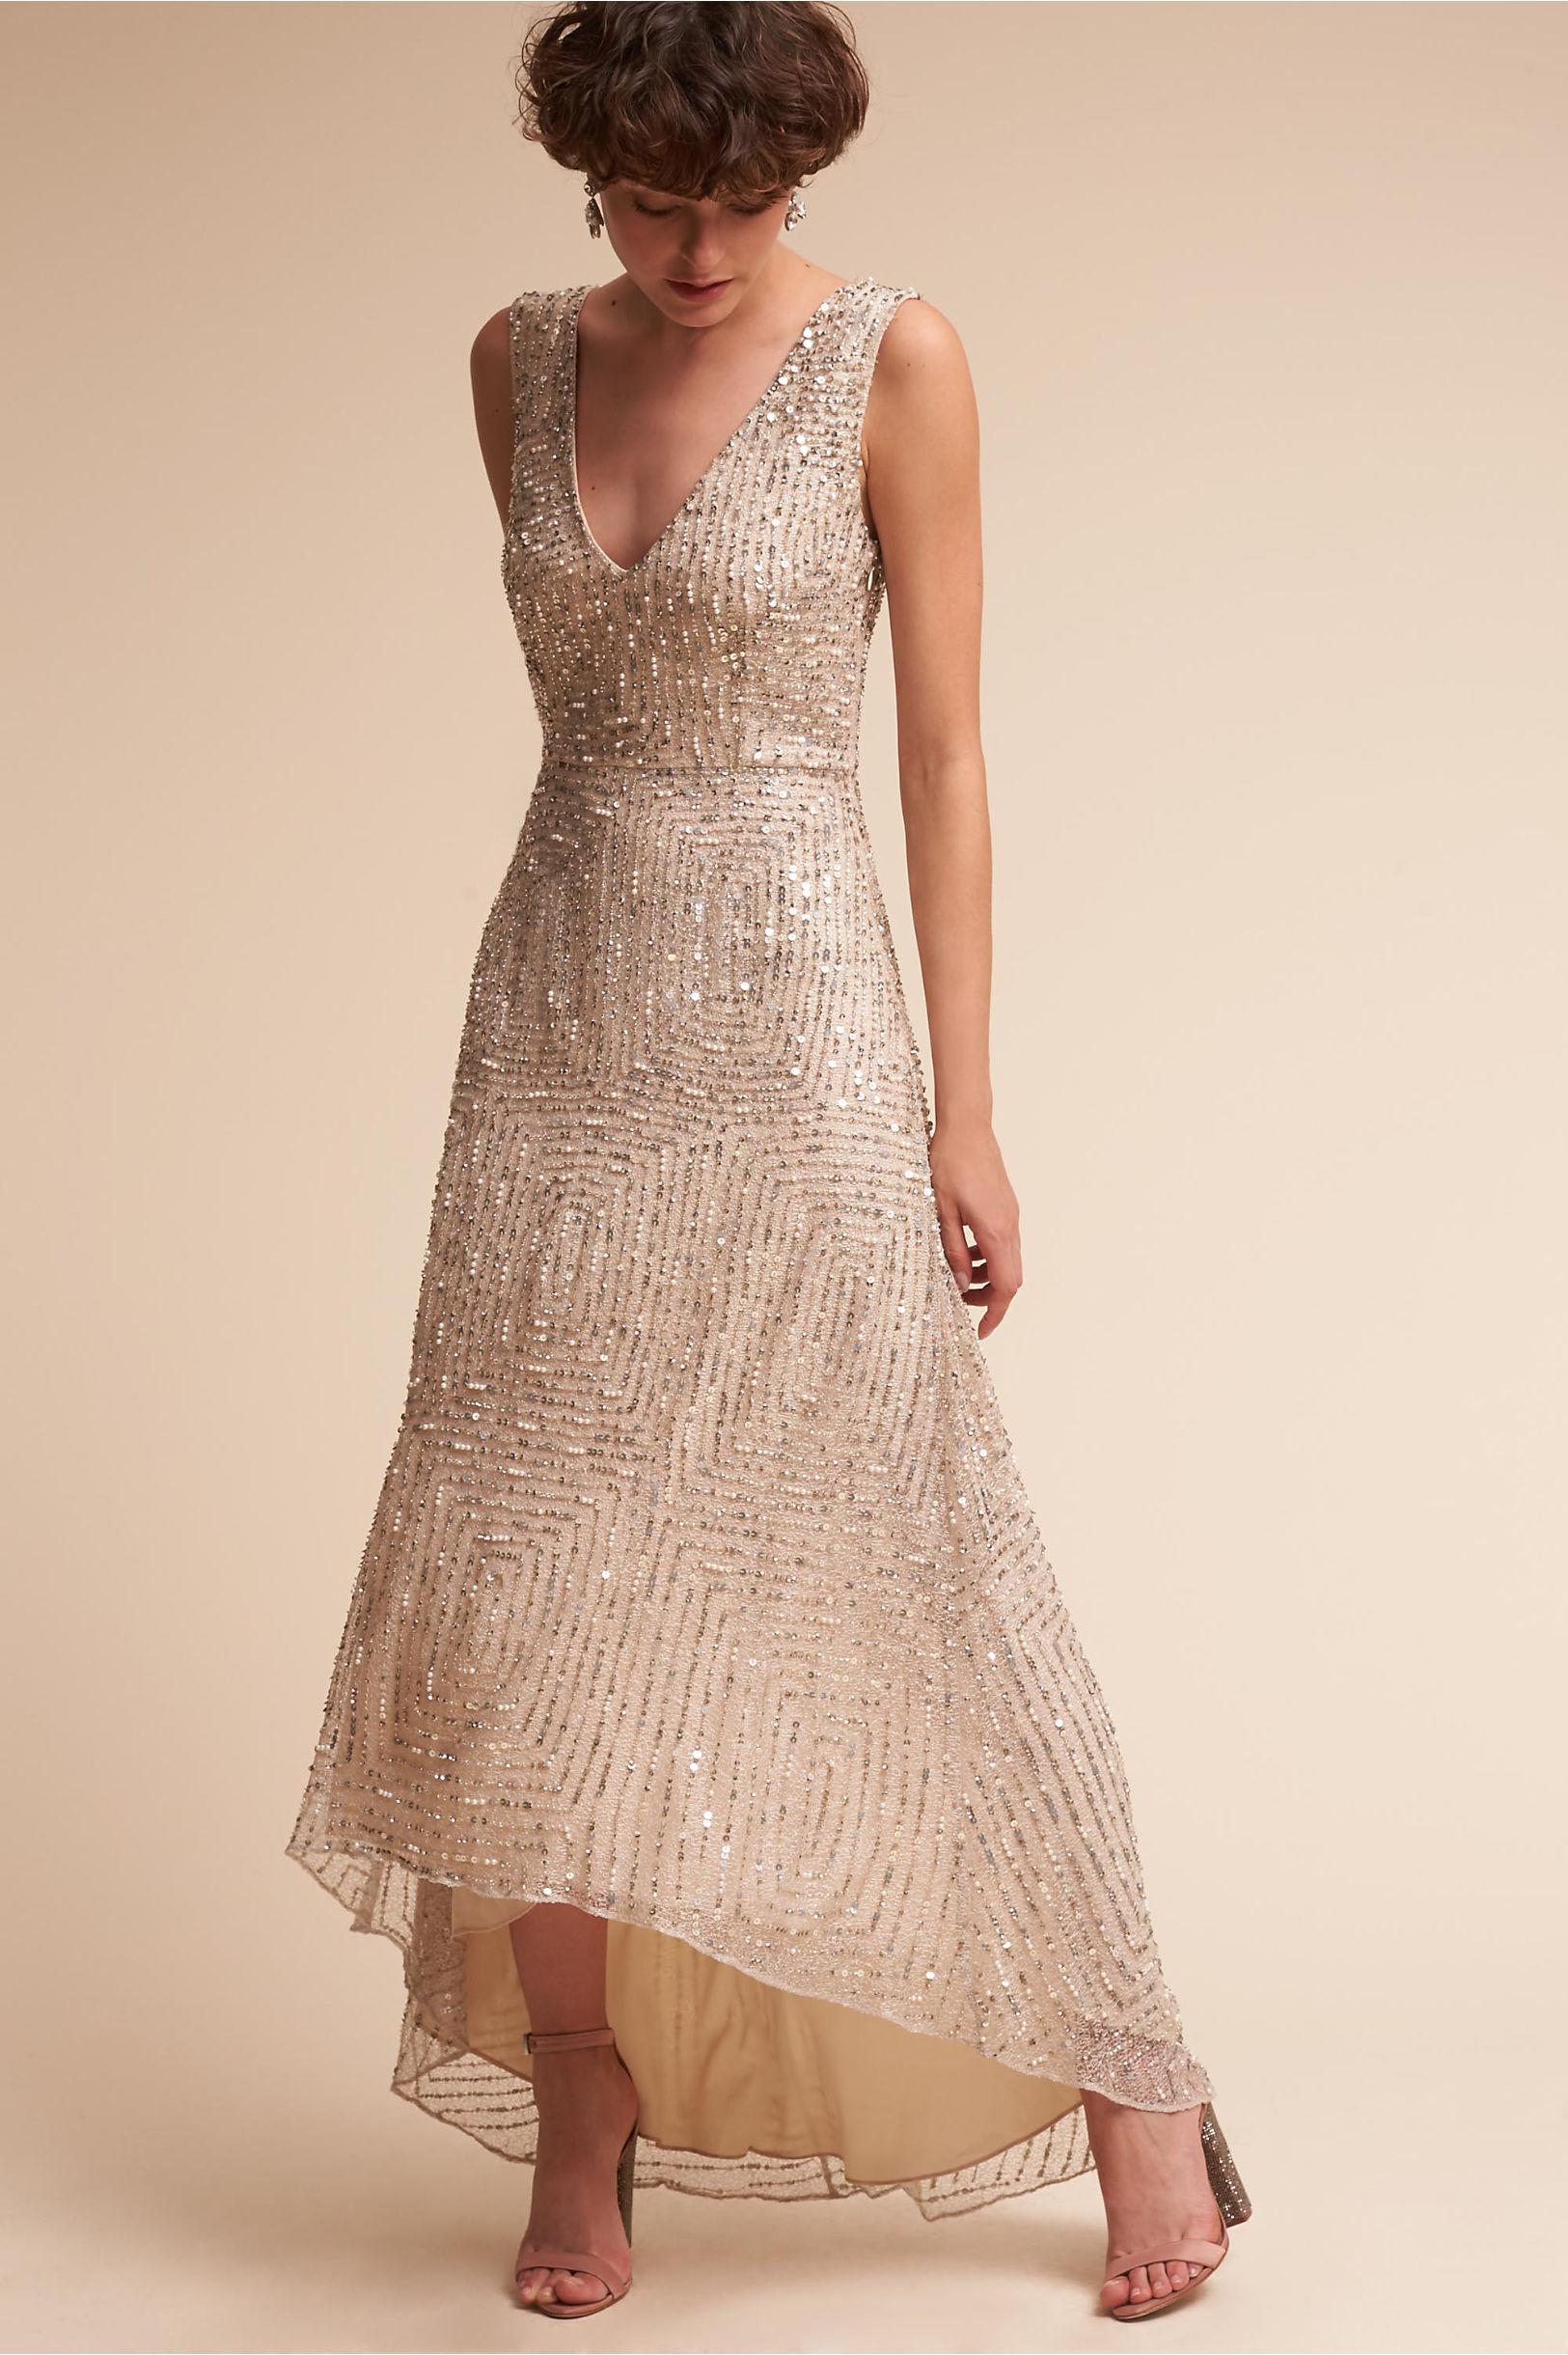 Tango Dress in Sale   BHLDN